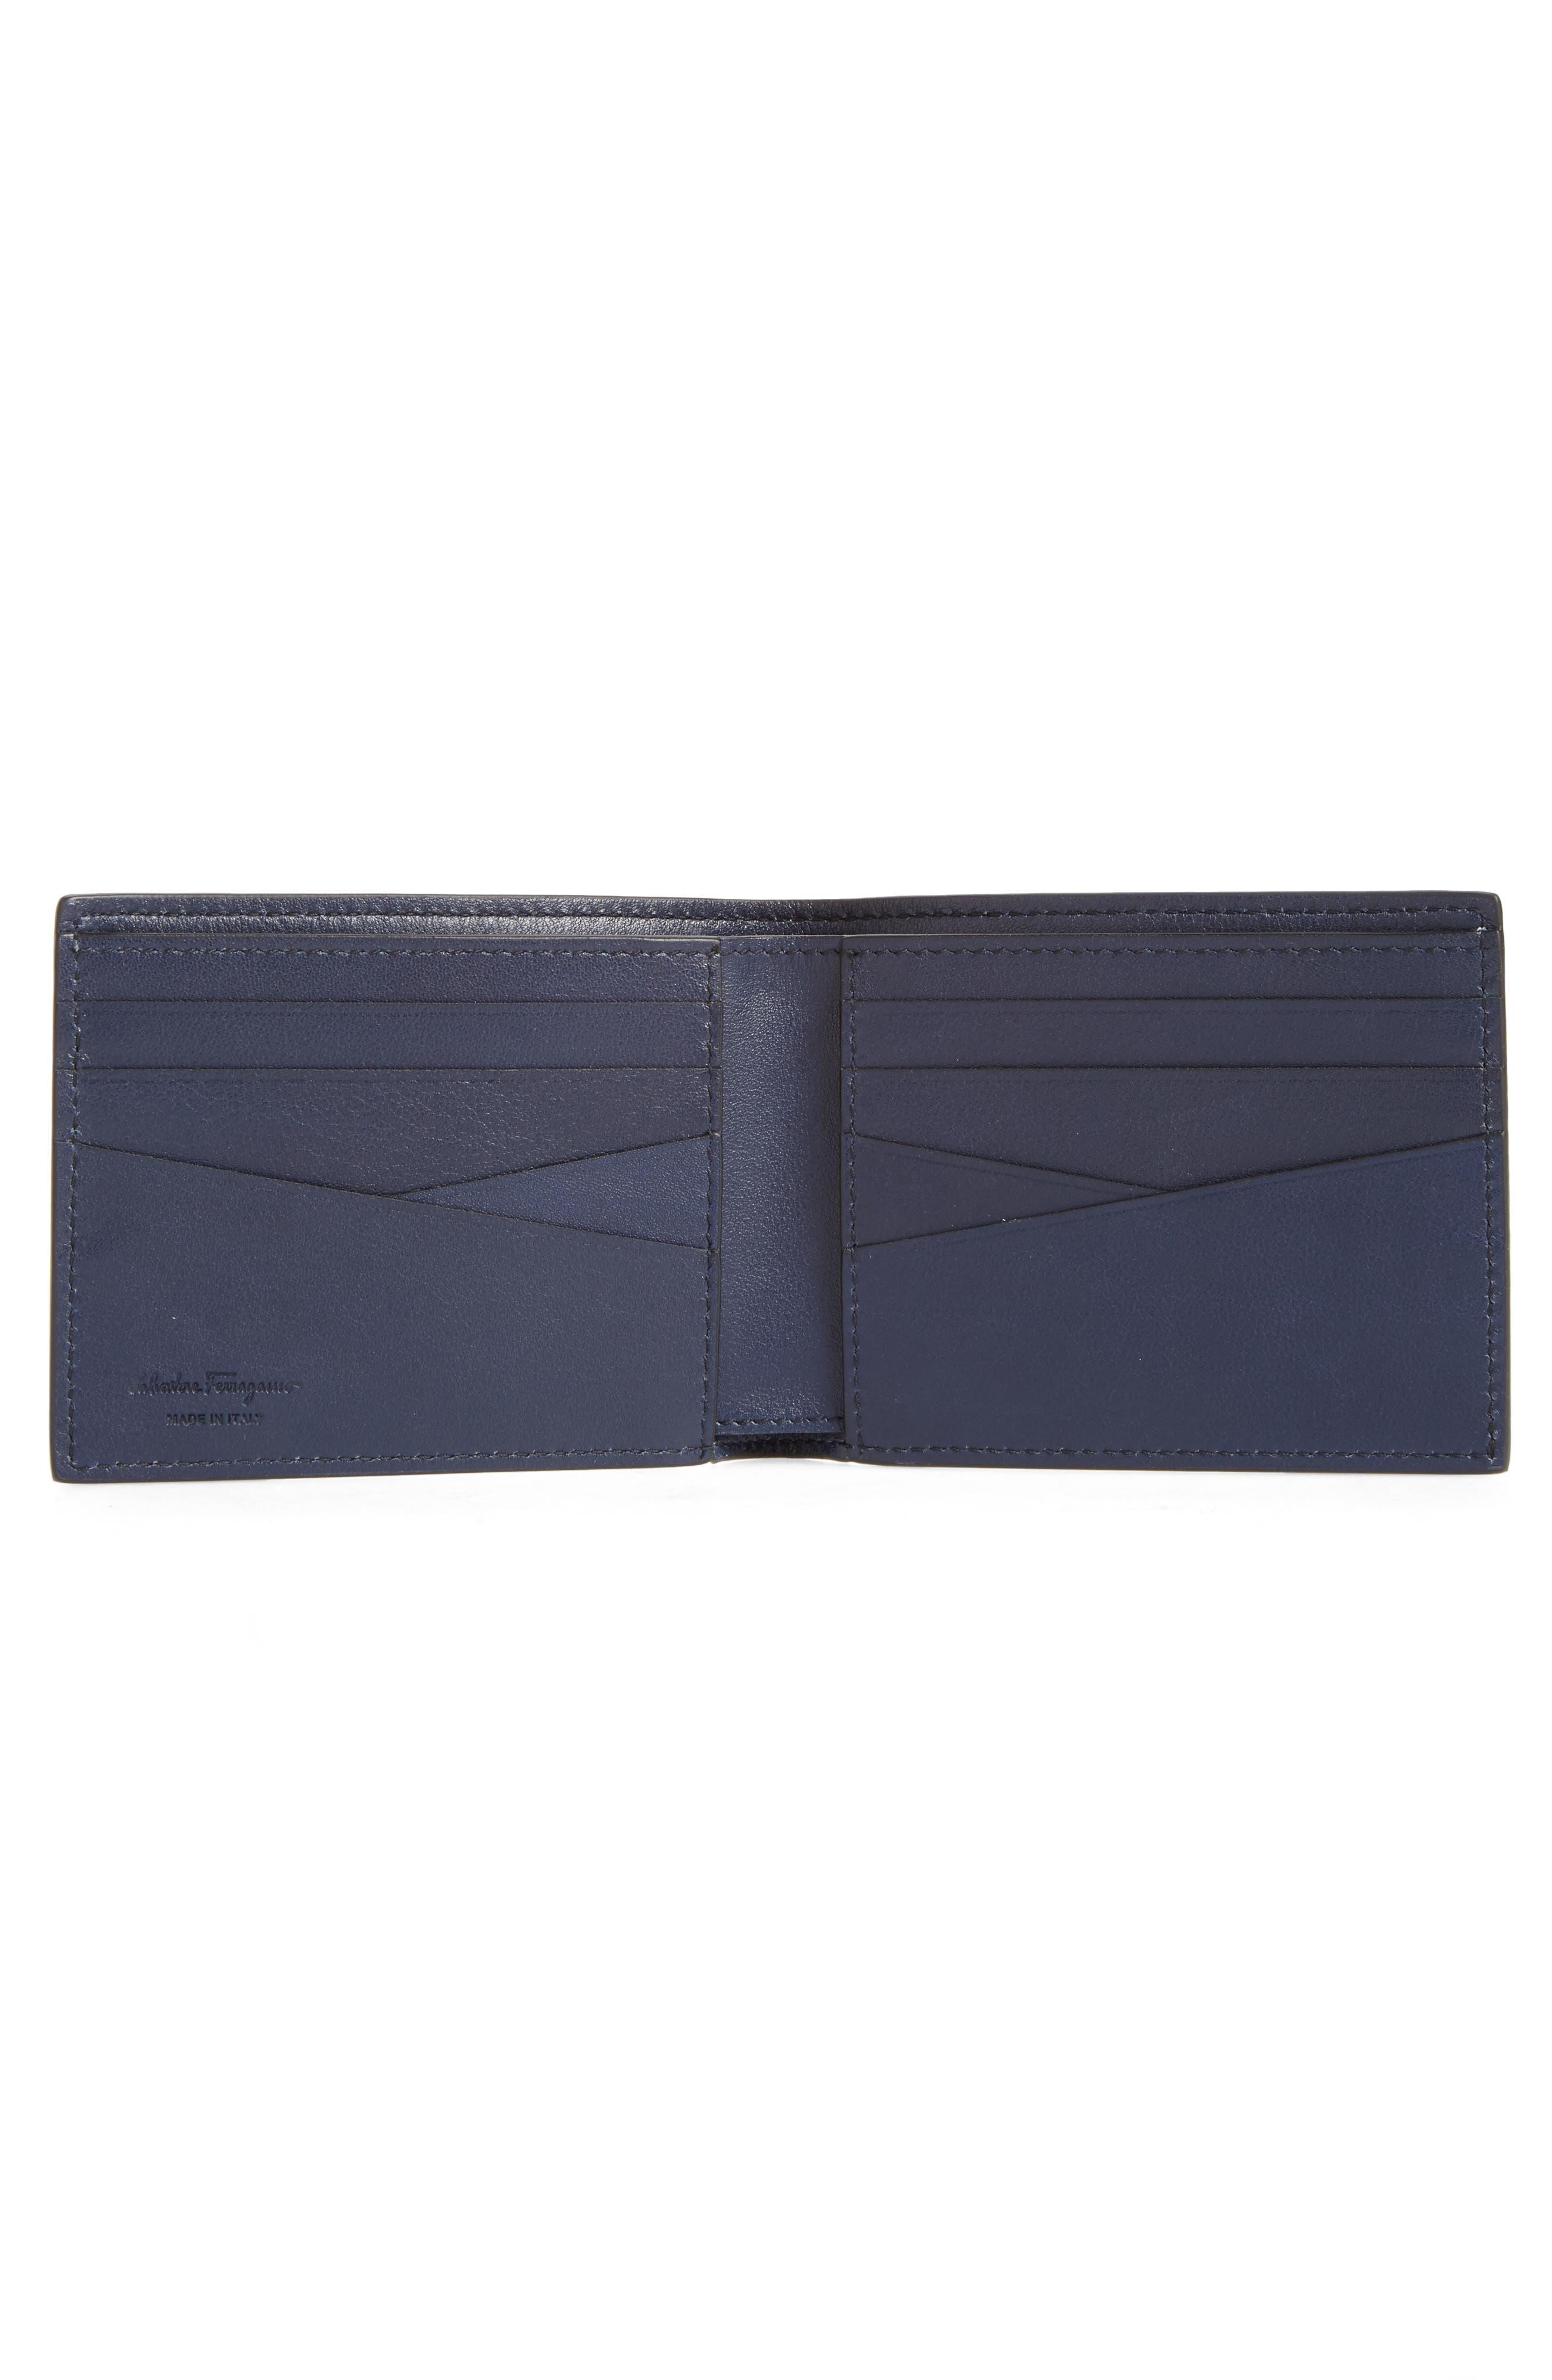 Firenze Glow Calfskin Leather Bifold Wallet,                             Alternate thumbnail 2, color,                             Blue